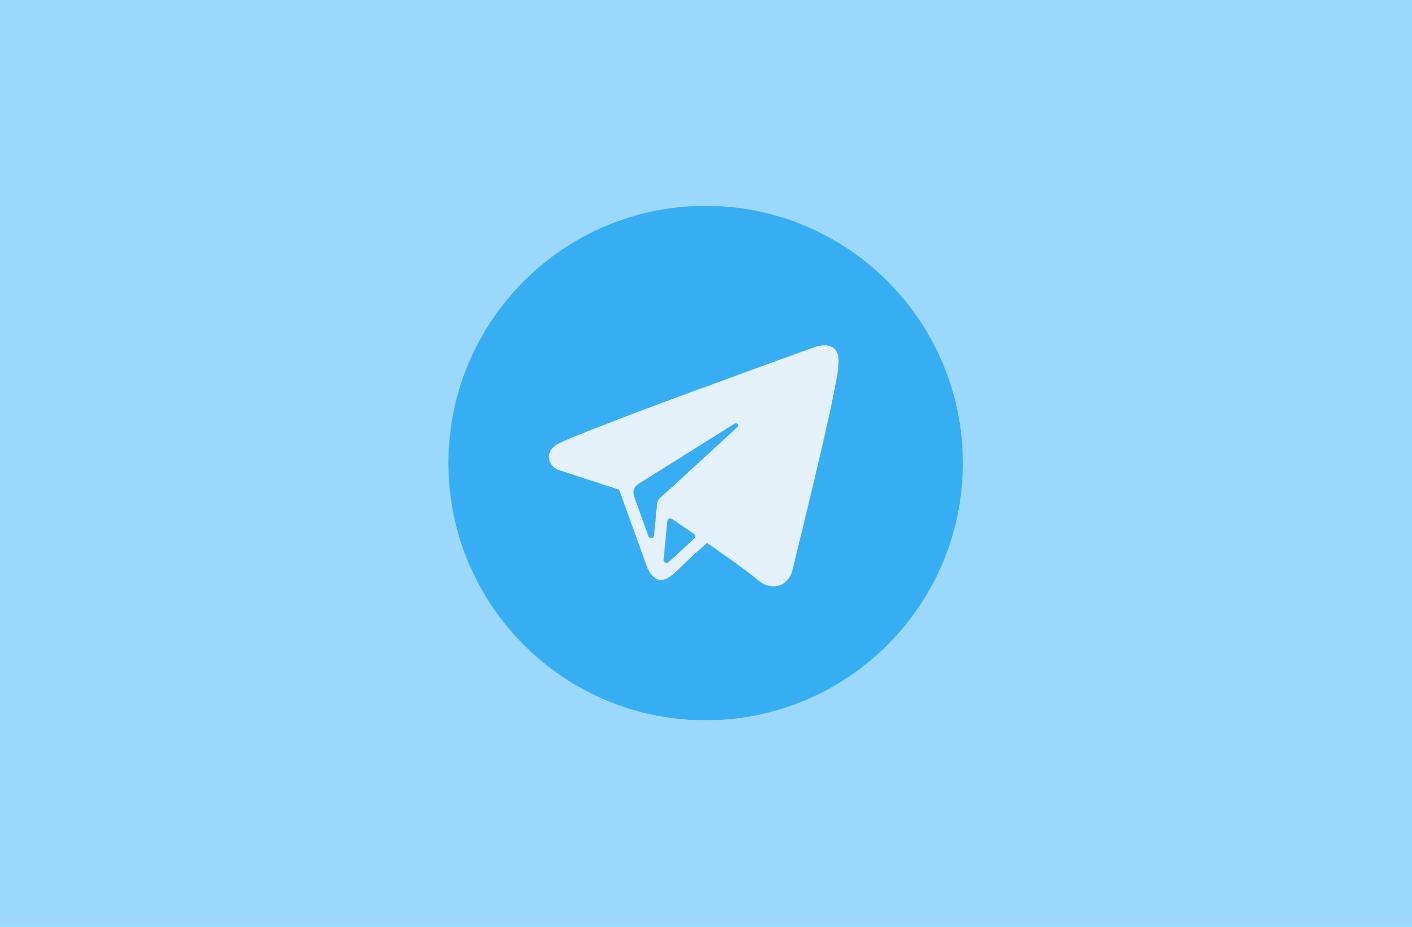 تاریخچه لوگو تلگرام